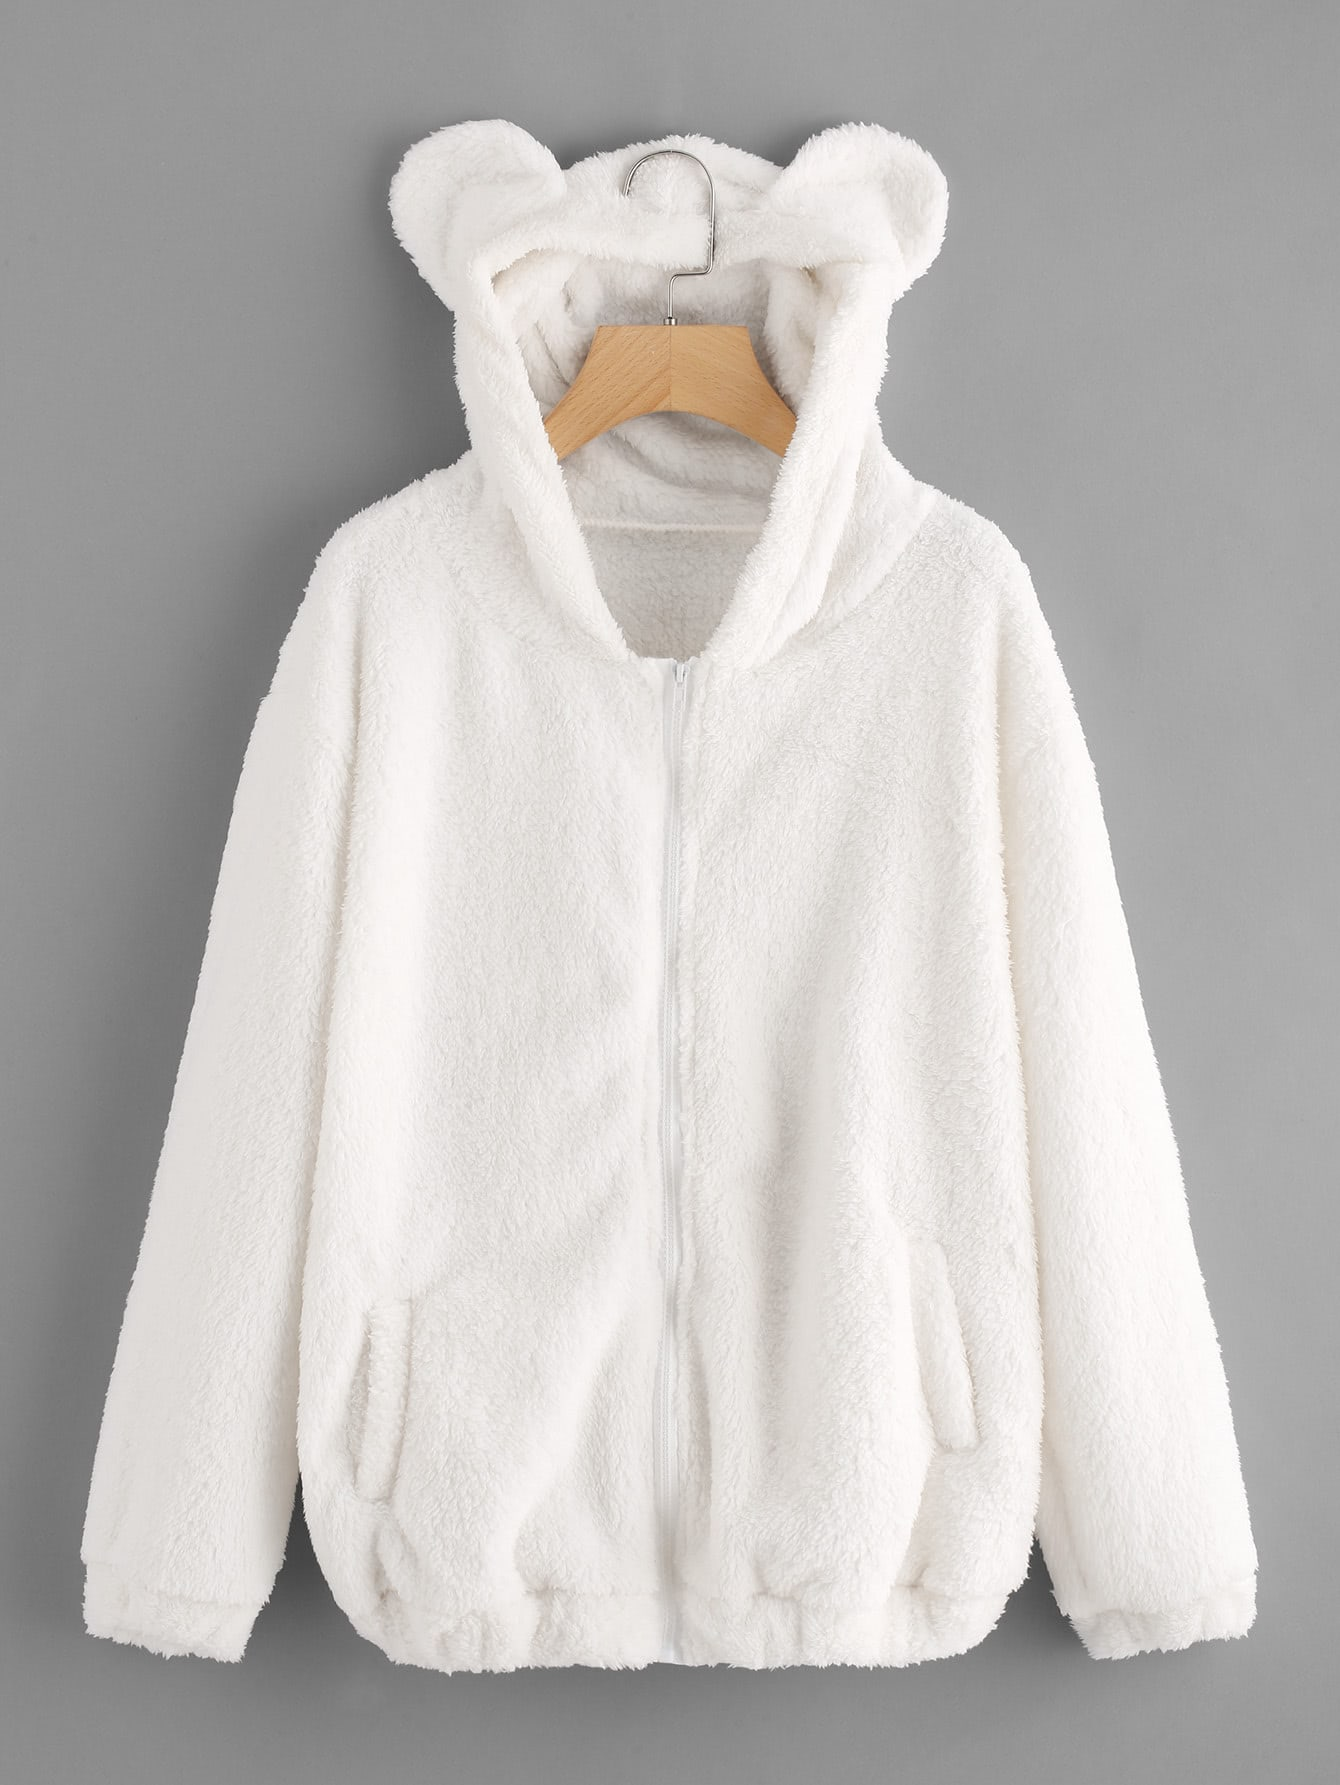 Faux Shearling Hooded Bear Coat dotfashion faux fur hooded shearling lined coat 2017 grey zipper long sleeve top female single breasted knee length coat